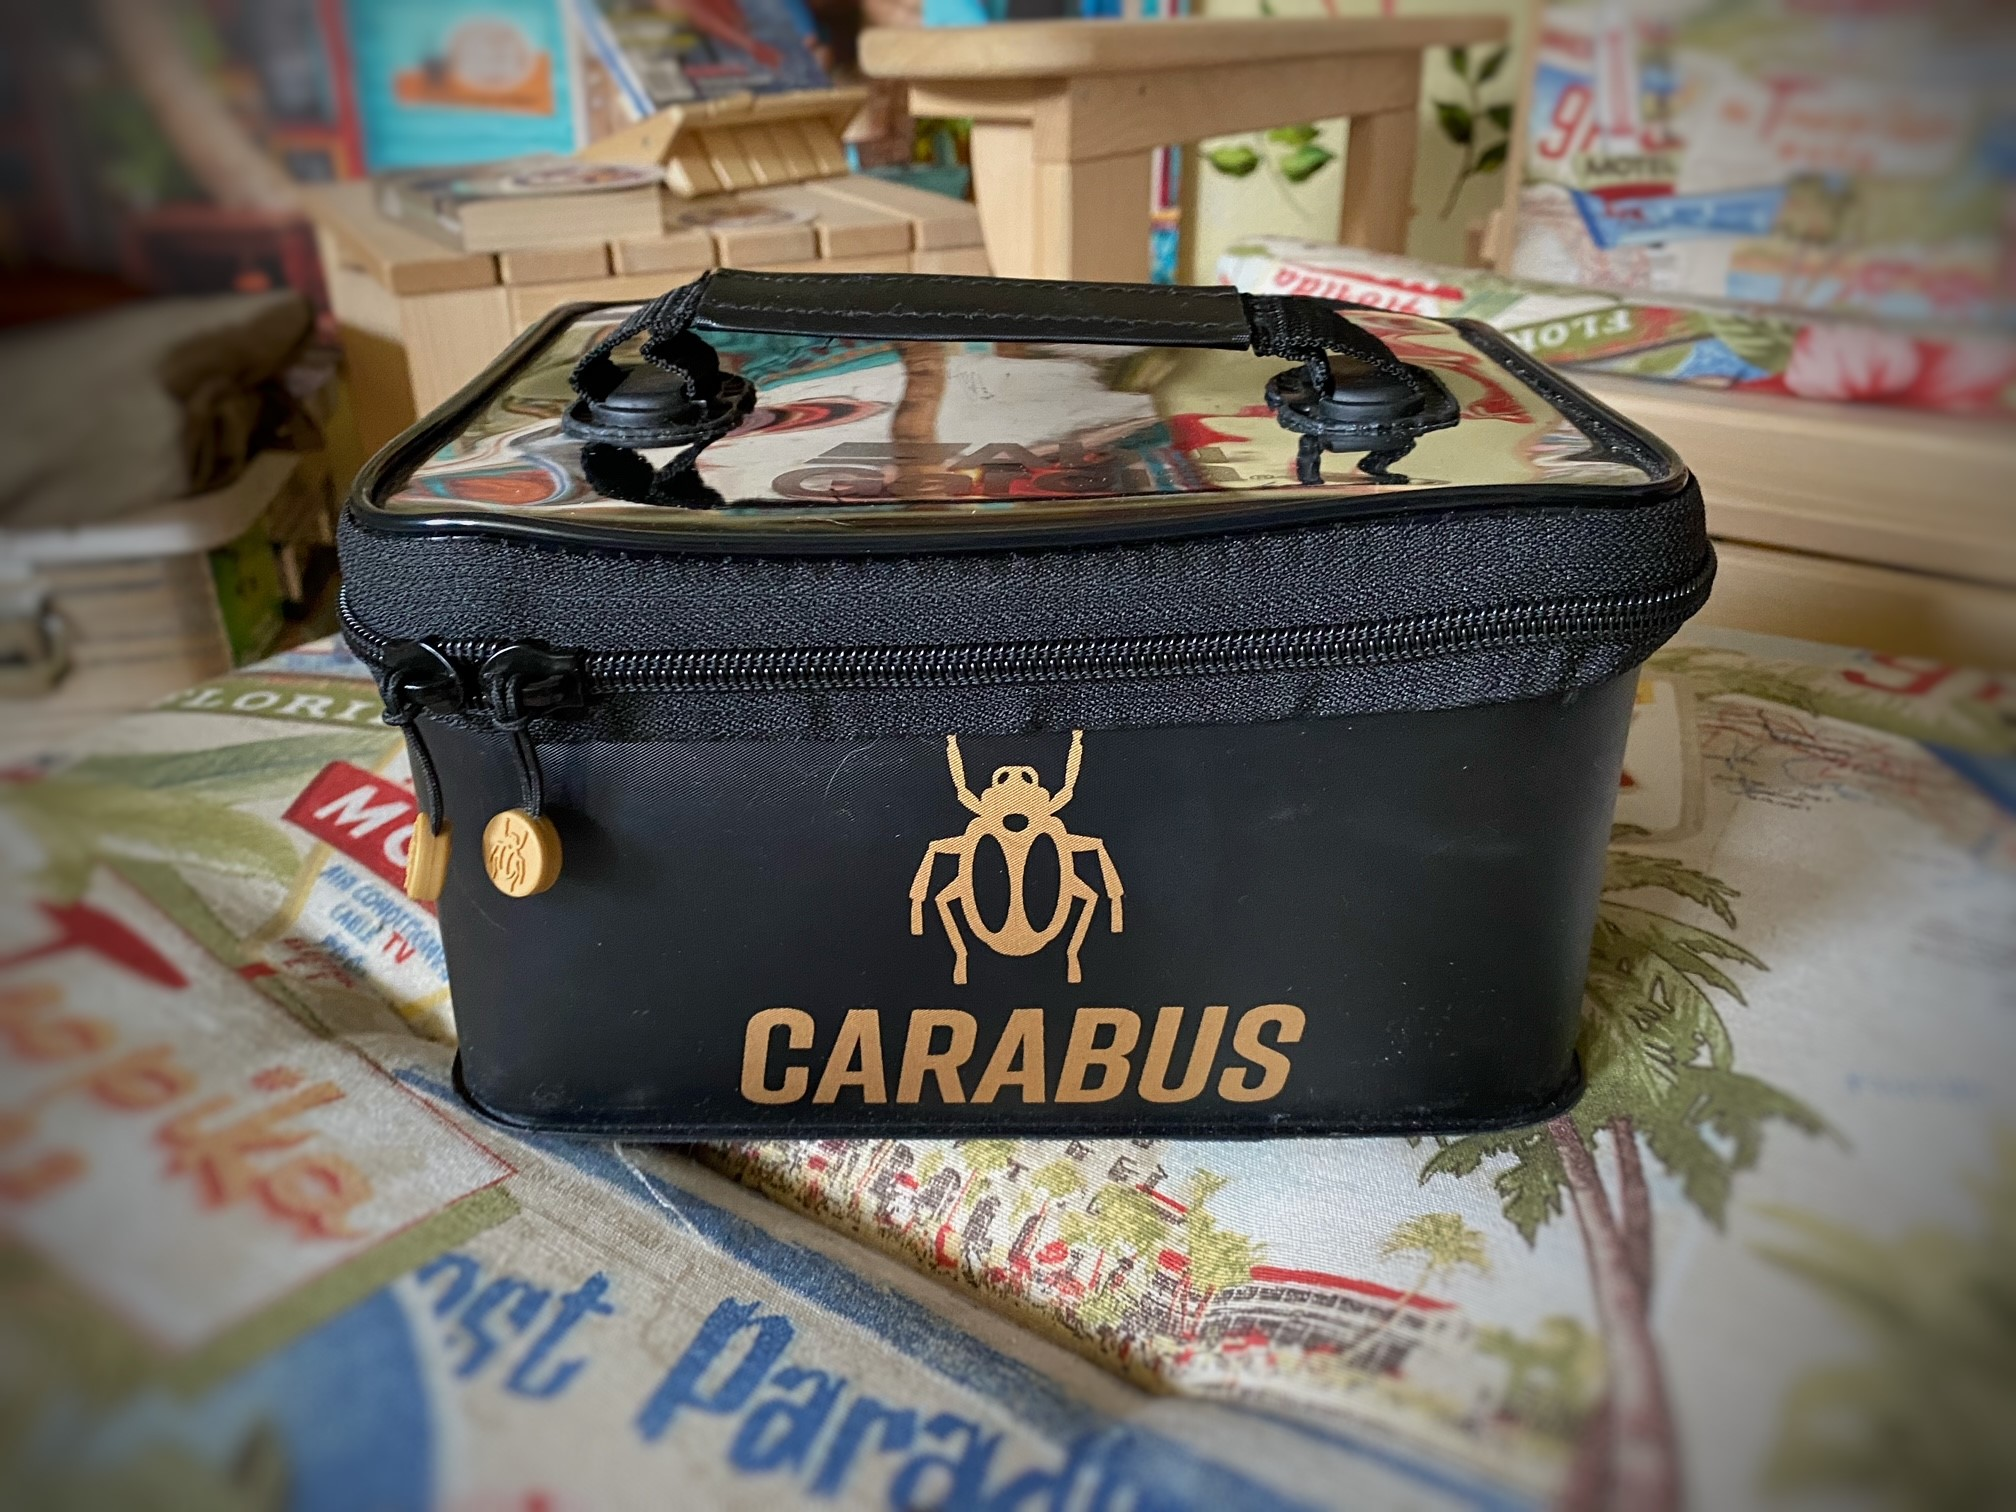 Carabus Tasche 2.jpg